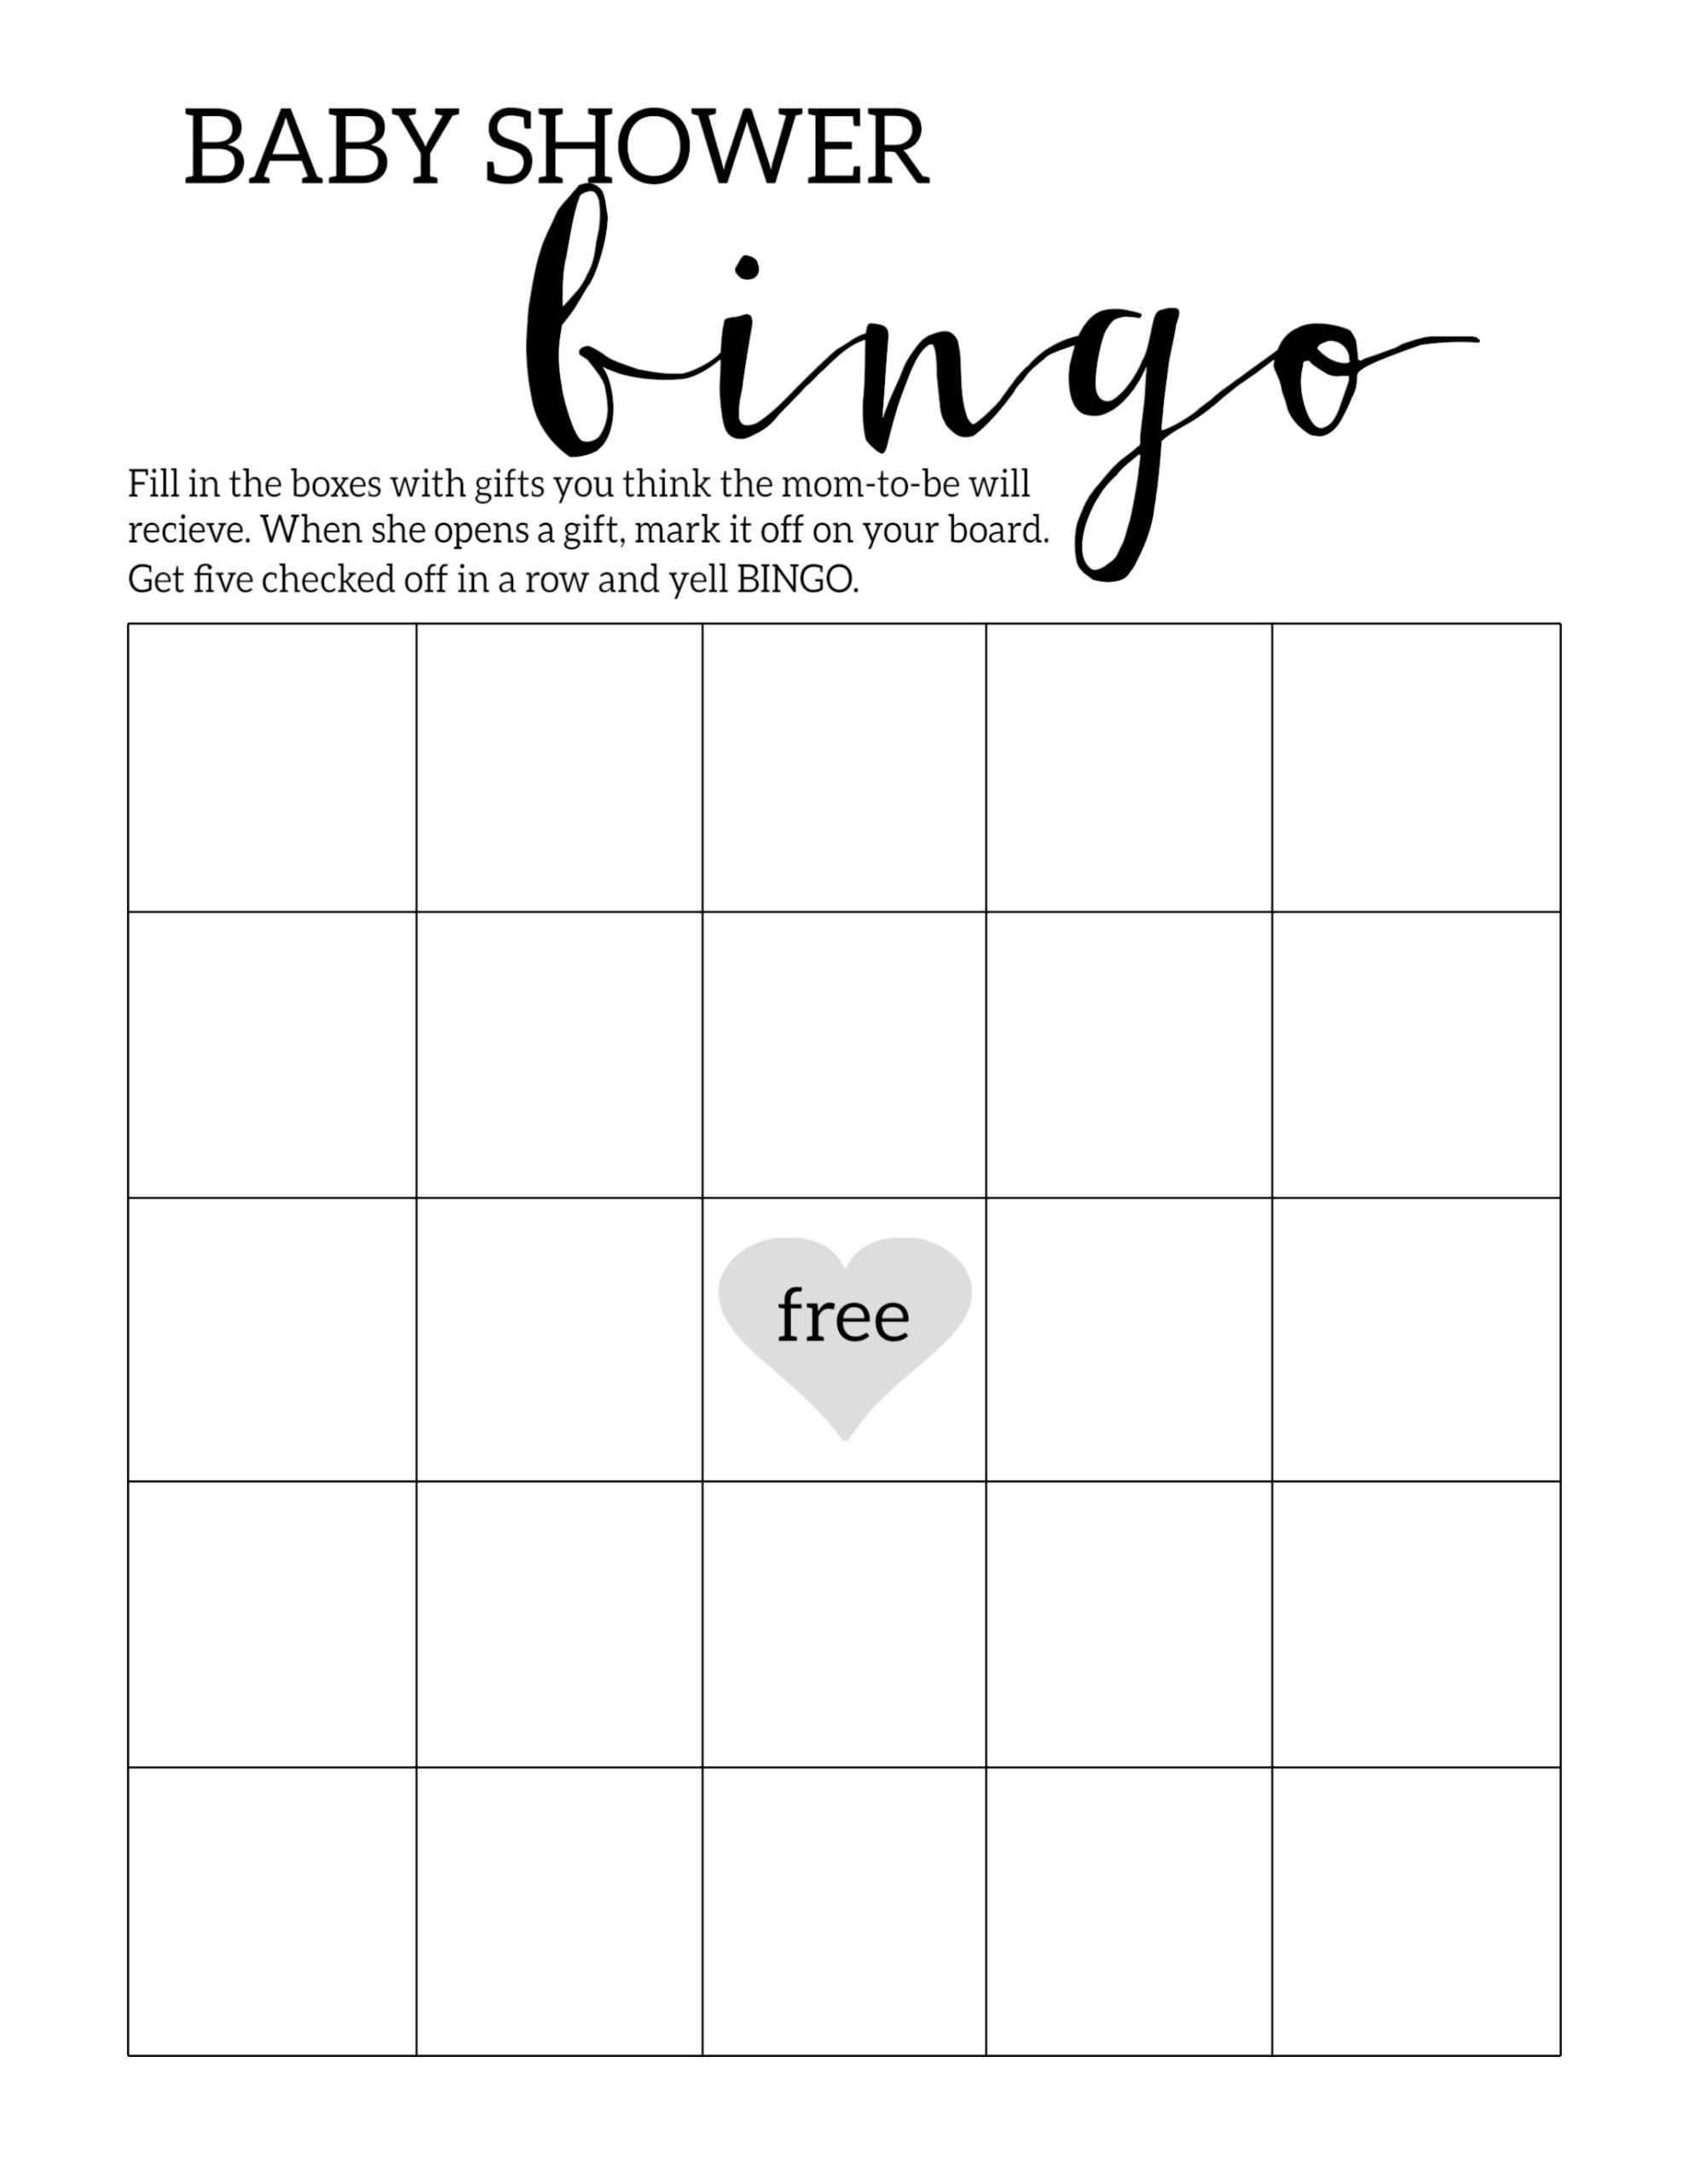 Baby Shower Bingo Printable Cards Template - Paper Trail Design - Free Printable Bingo Games